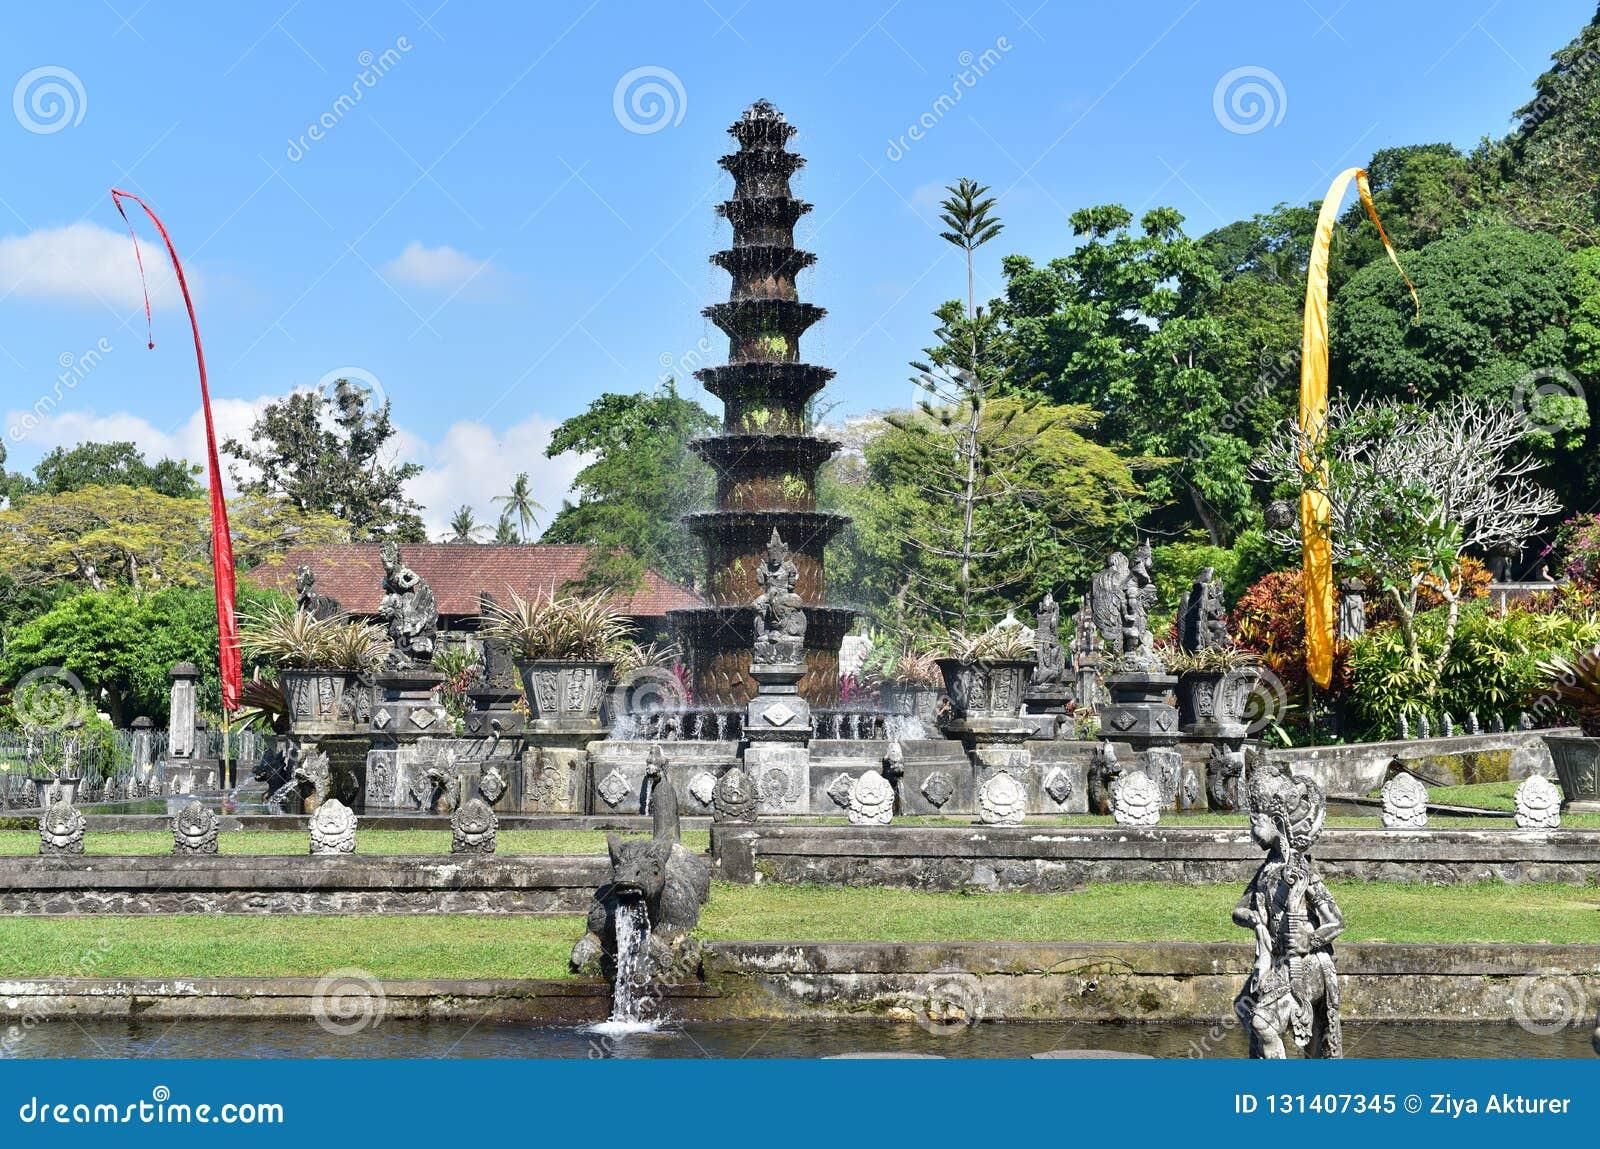 Hindu Balinese Water Palace Tirta Gangga Bali Island Indonesia